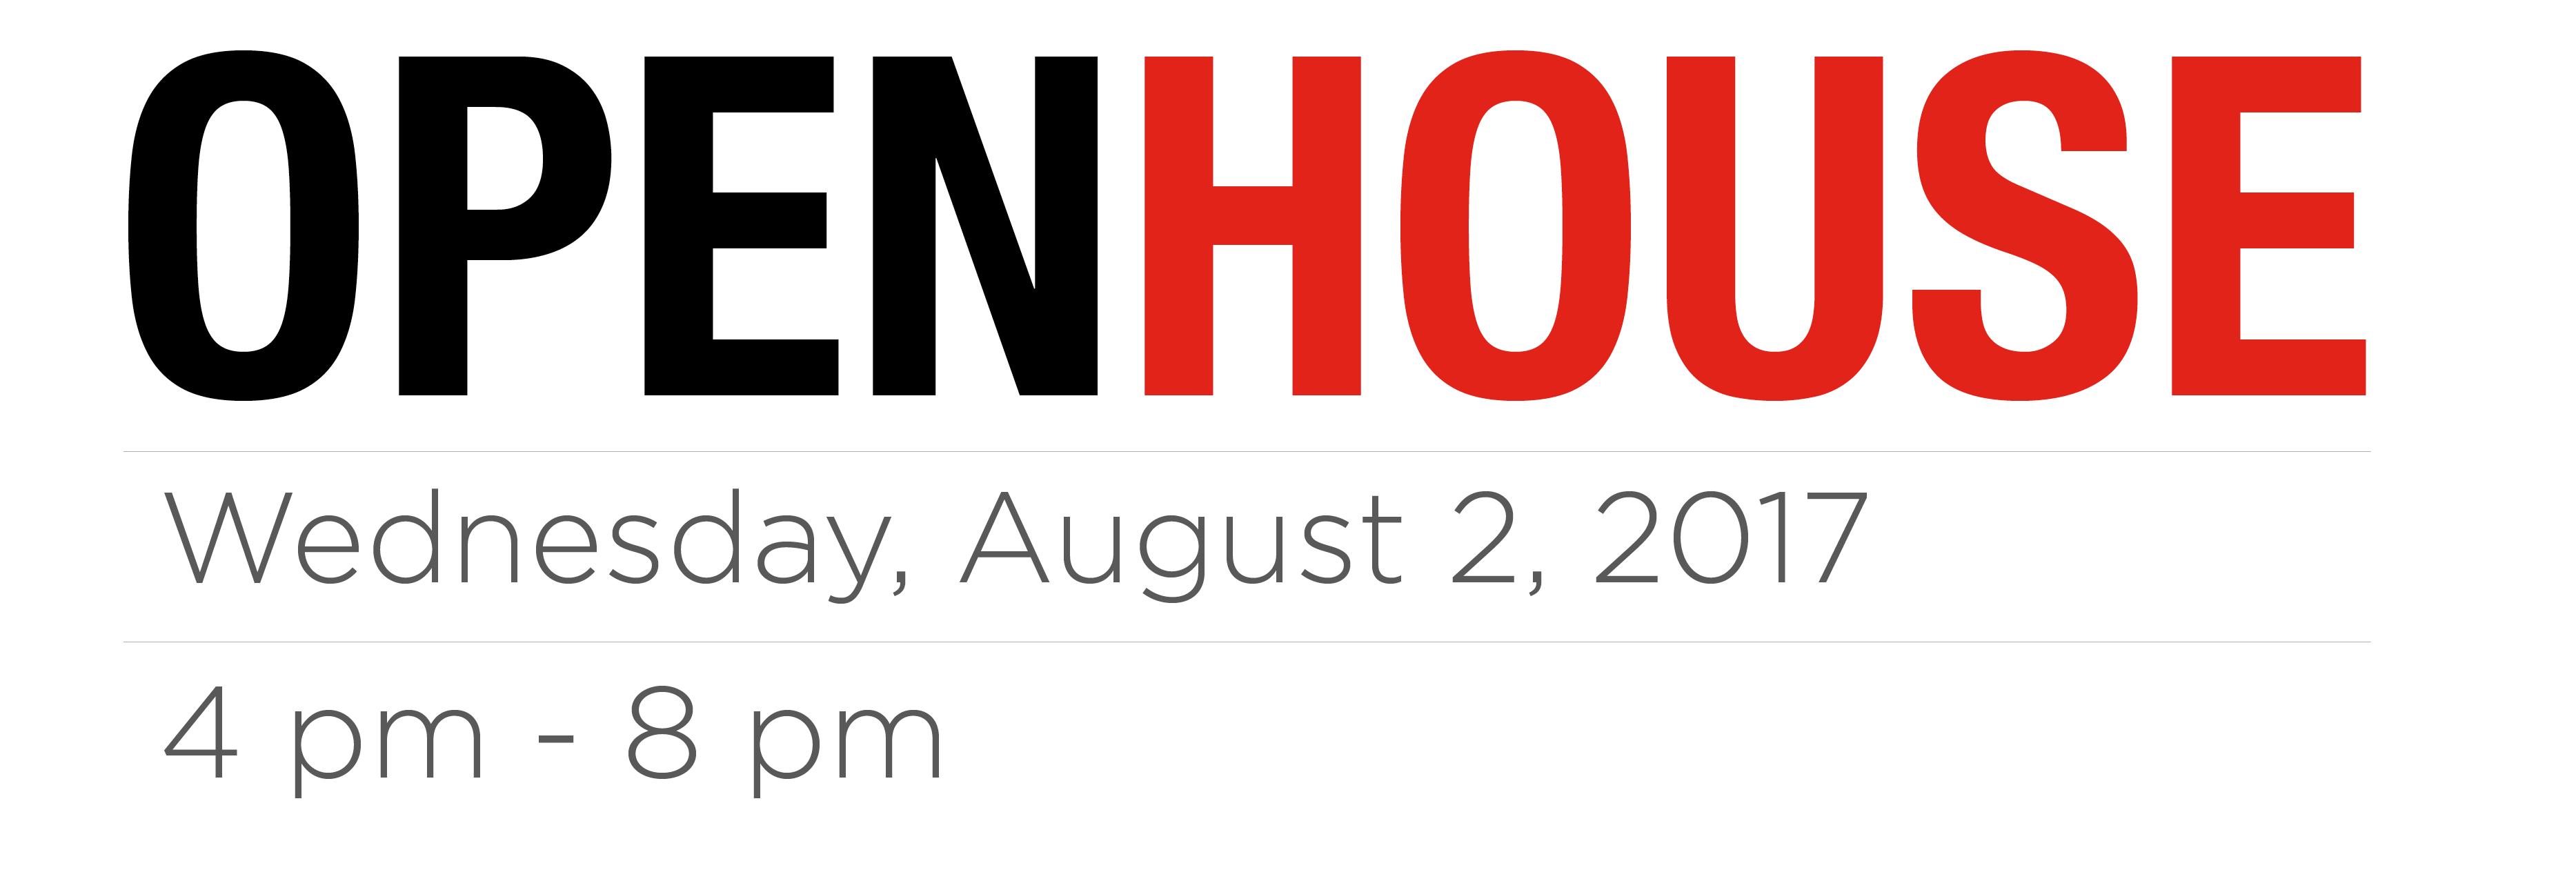 Open House Aug 2, 2017